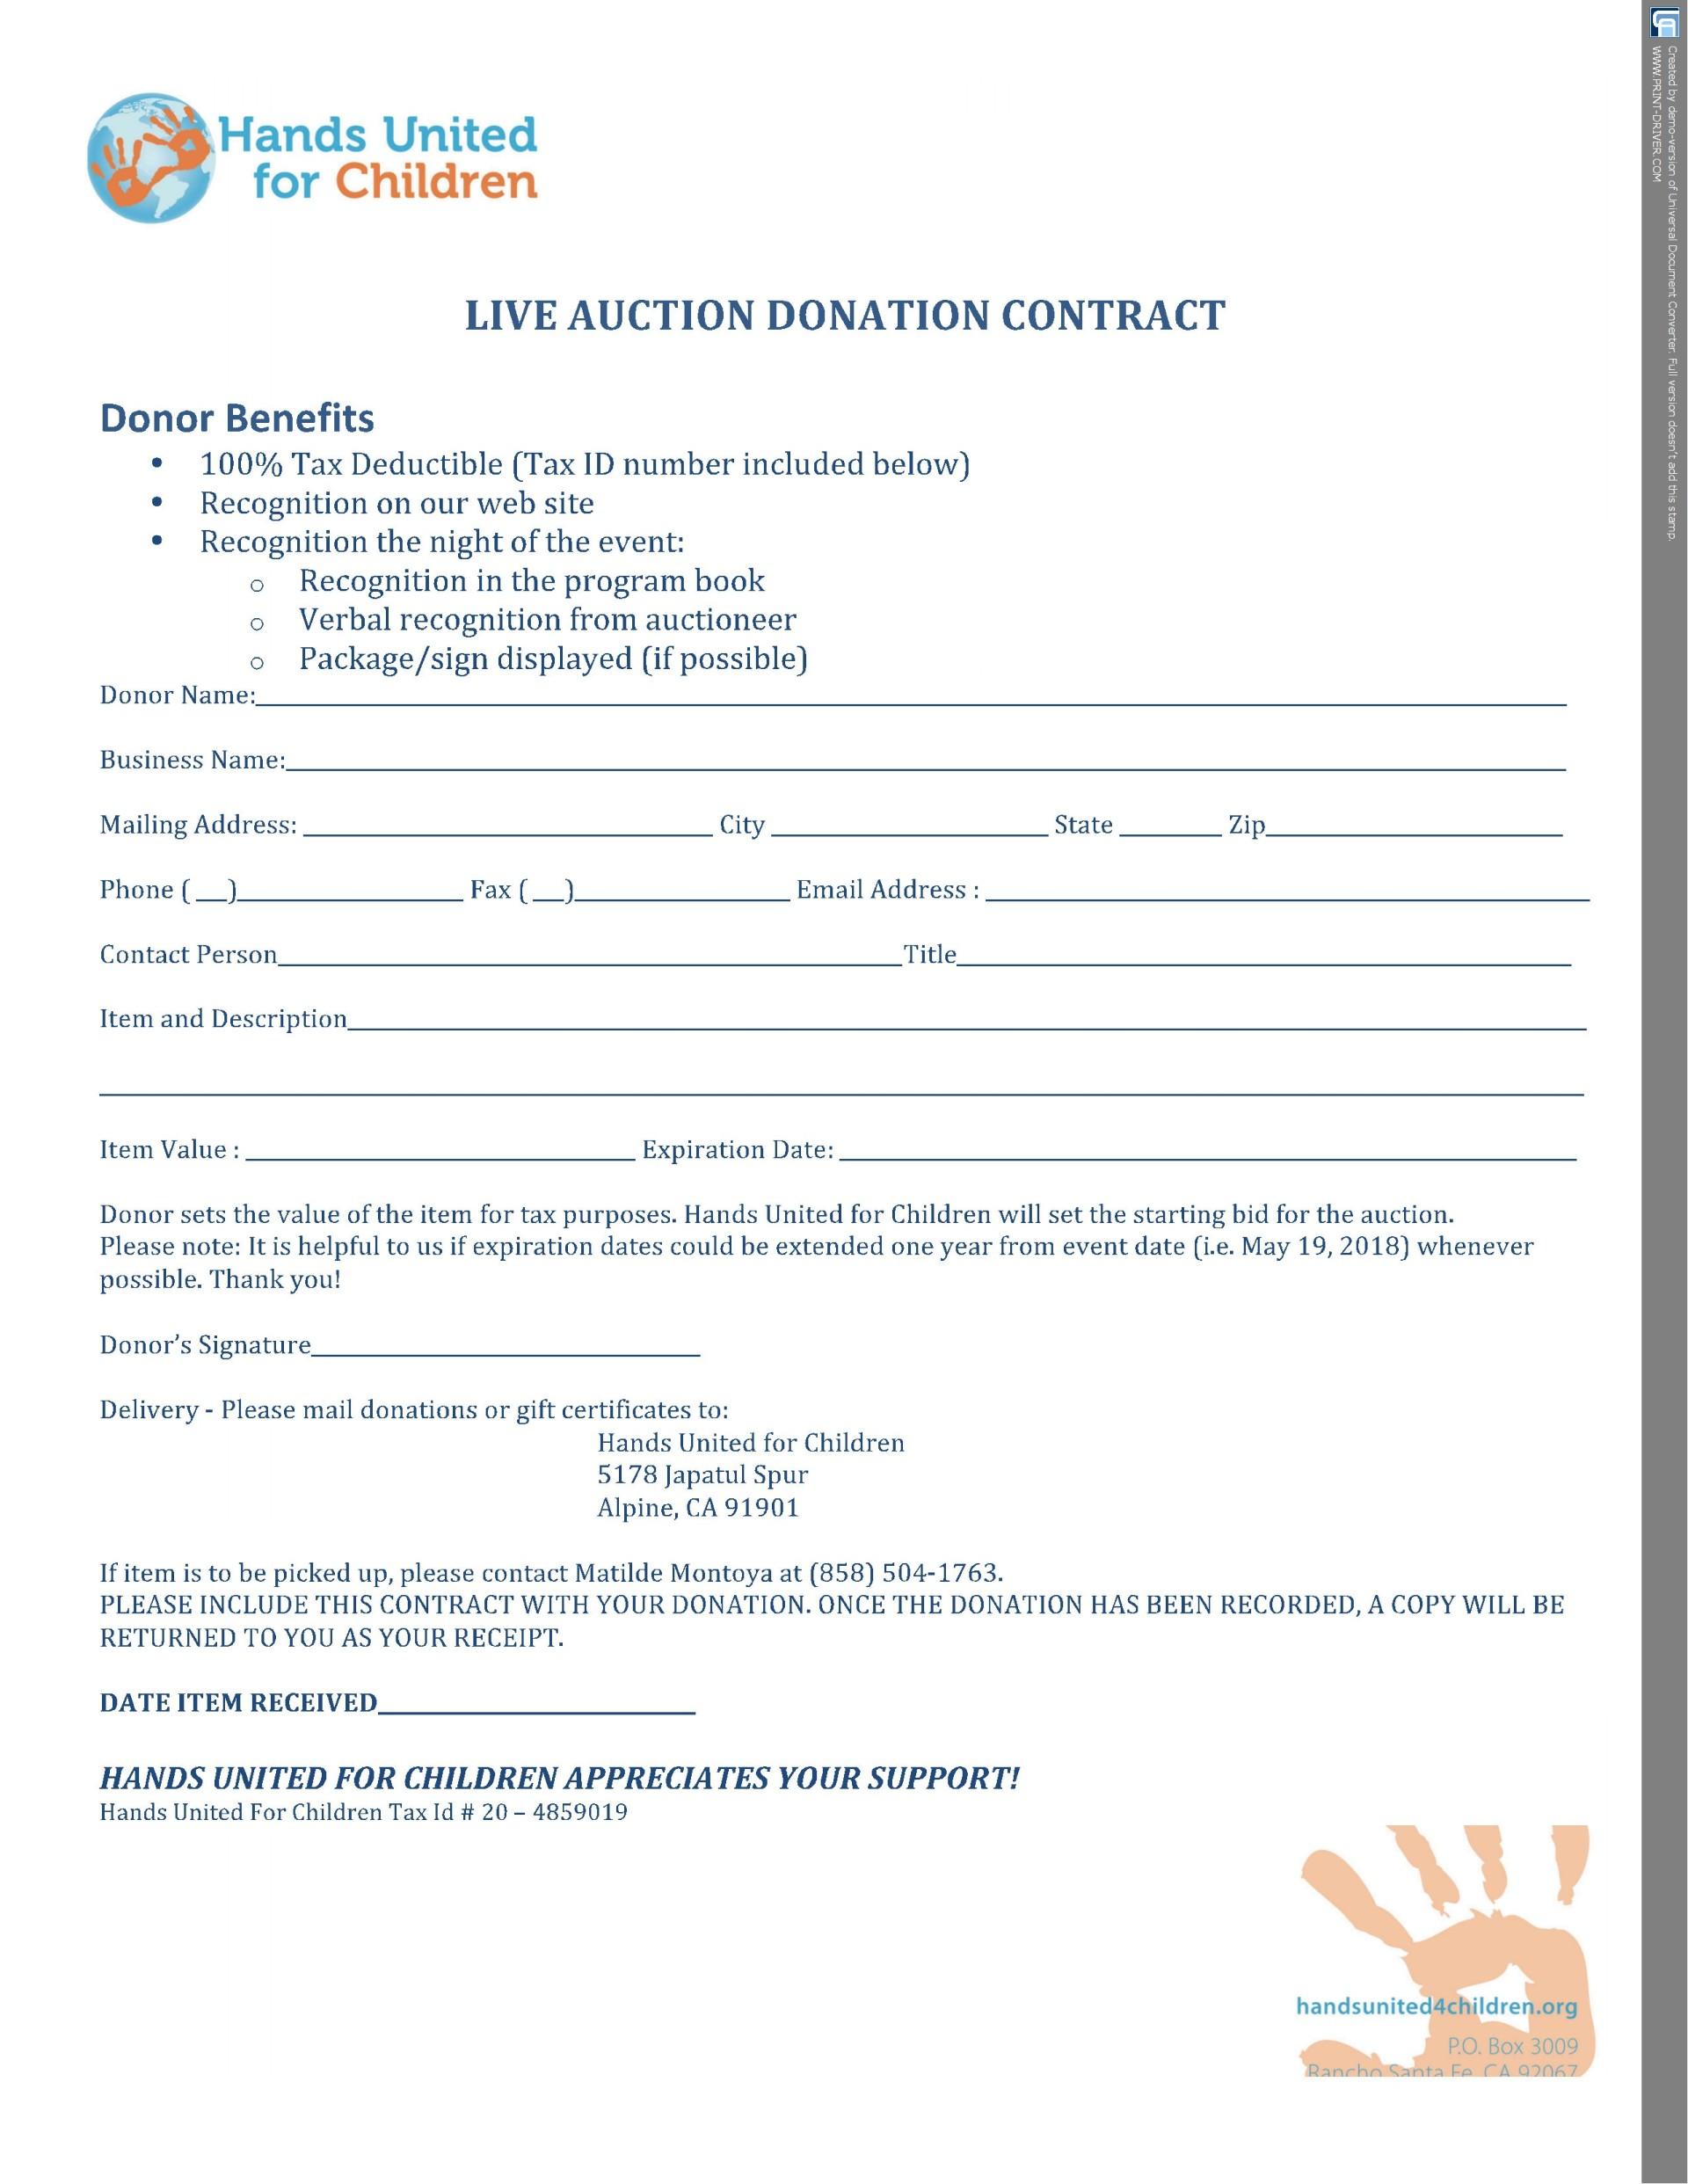 2017-HUFC-Live-Auction-Form-w1920.jpg